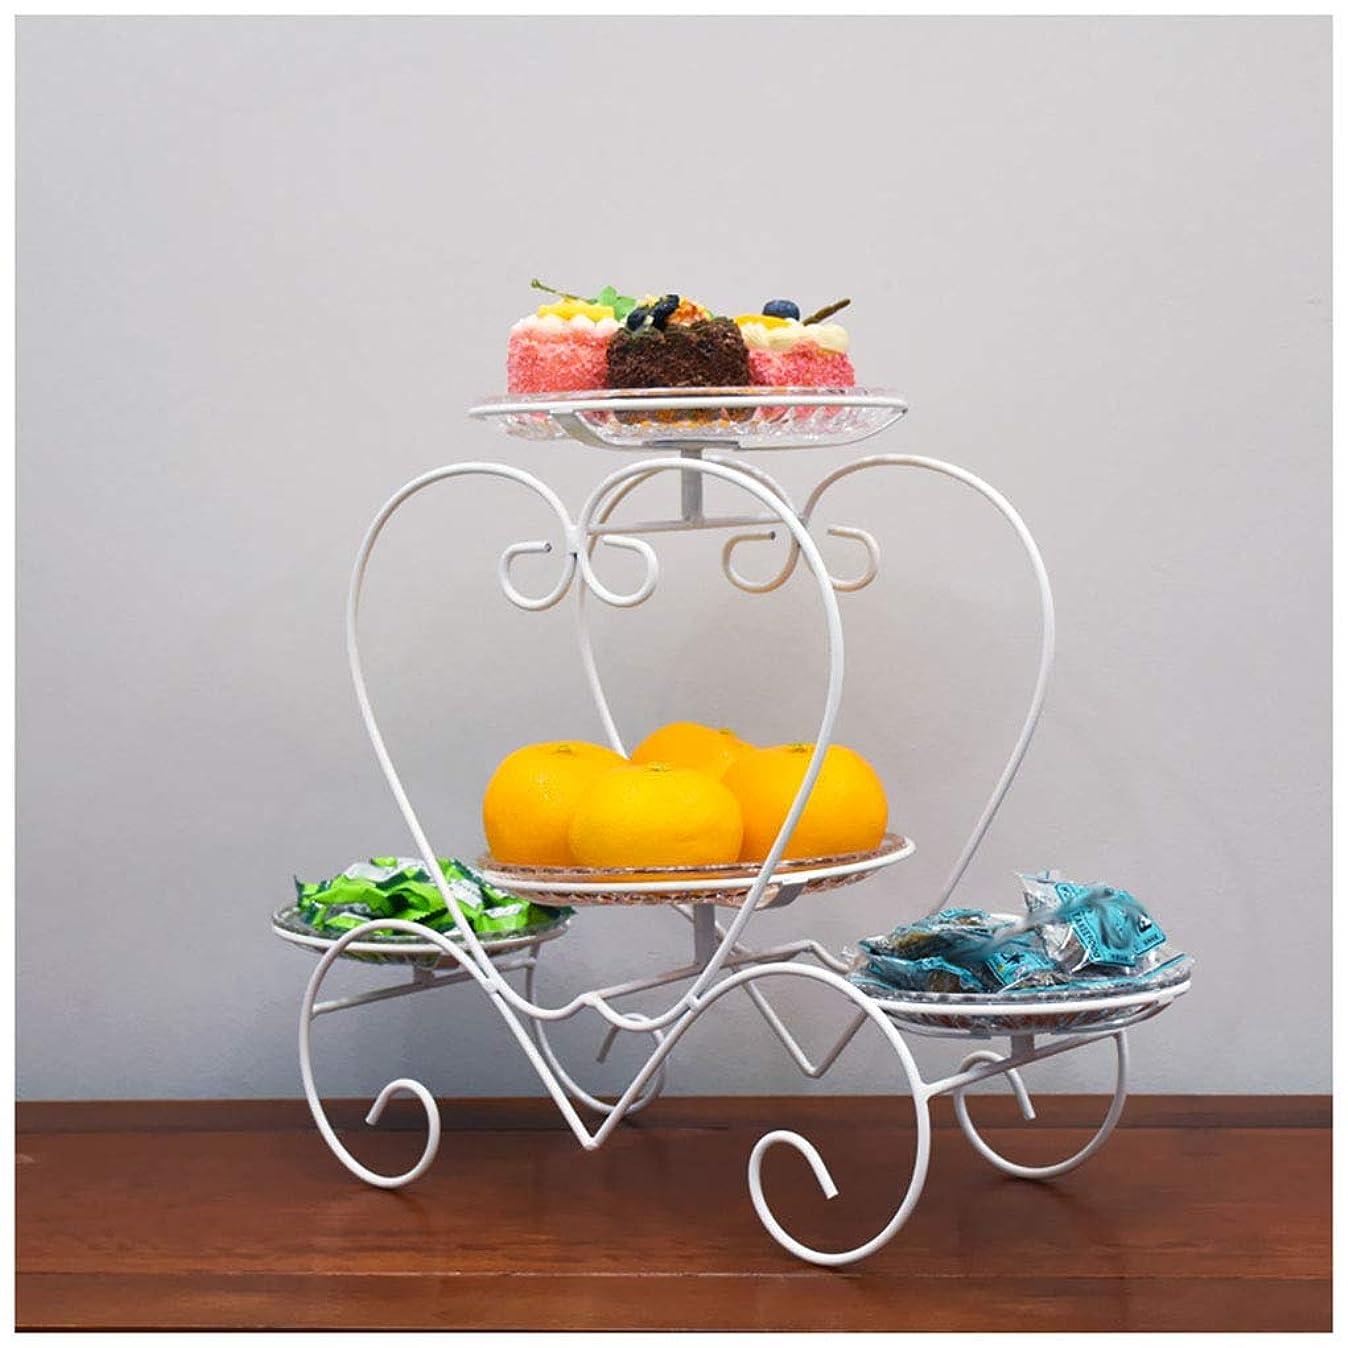 Fruit Bowls Household Fruit Bowl Metal Fruit Basket Vegetable Bowl Basket Rack Storage Stand Display for Parties Fruit Plates (color : White) c3206917896